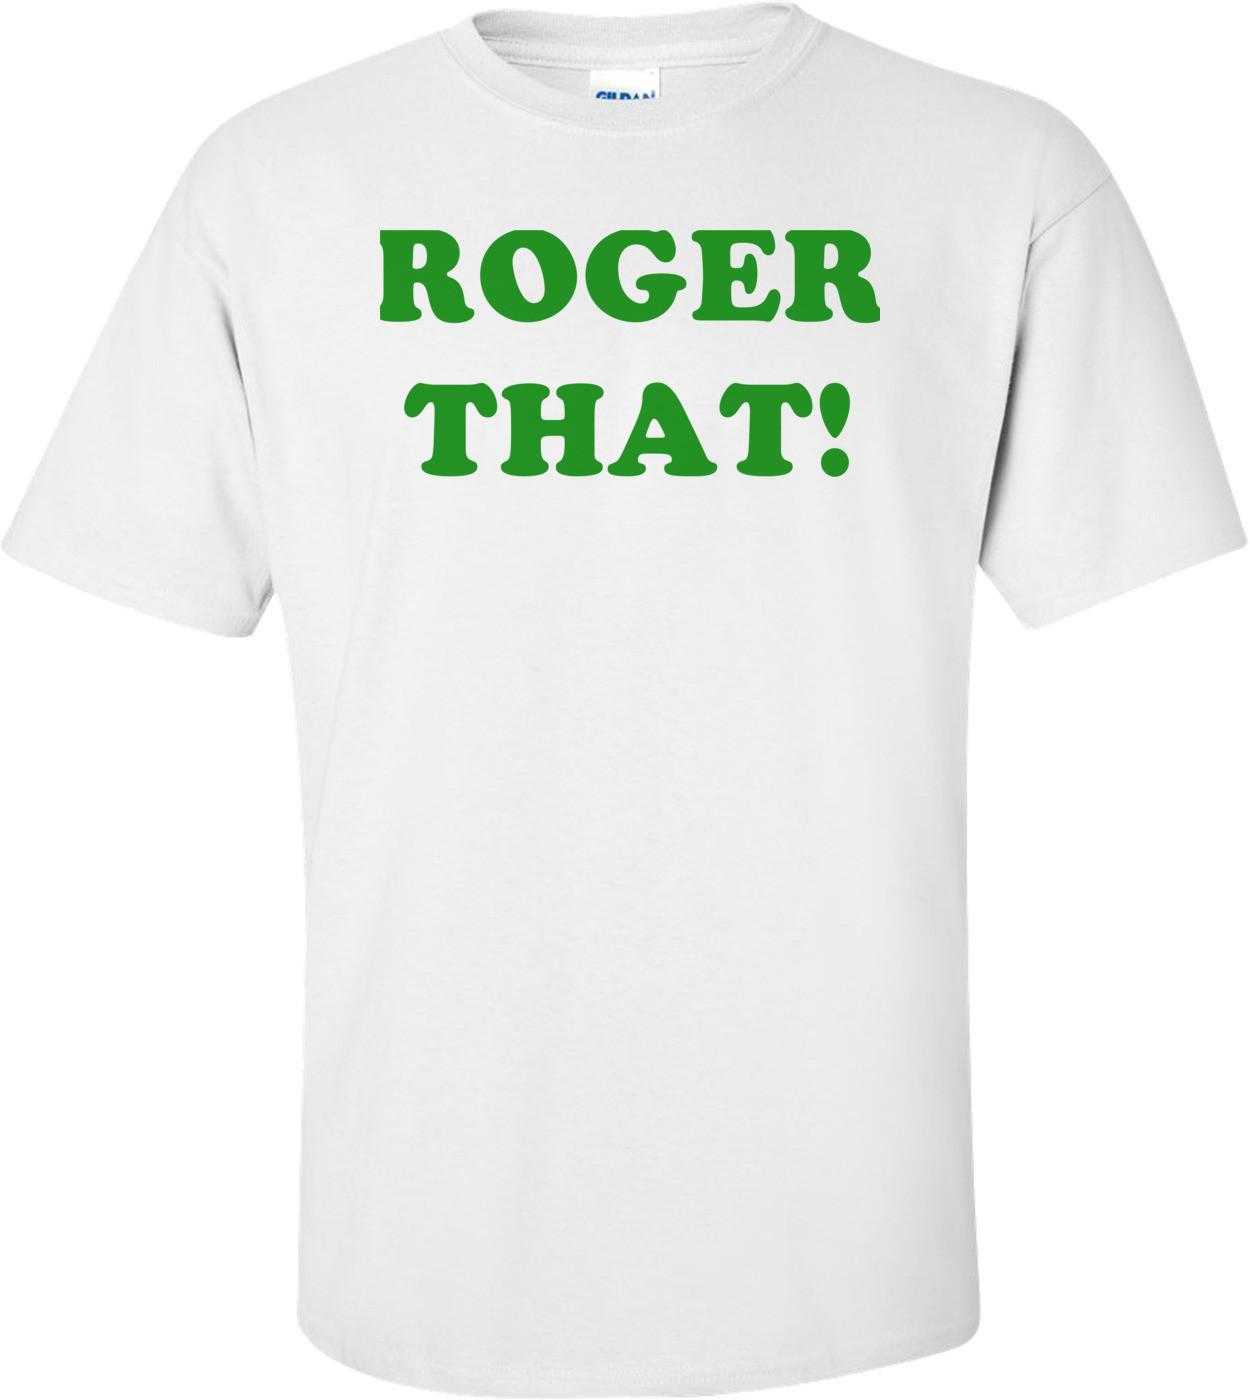 ROGER THAT! Shirt